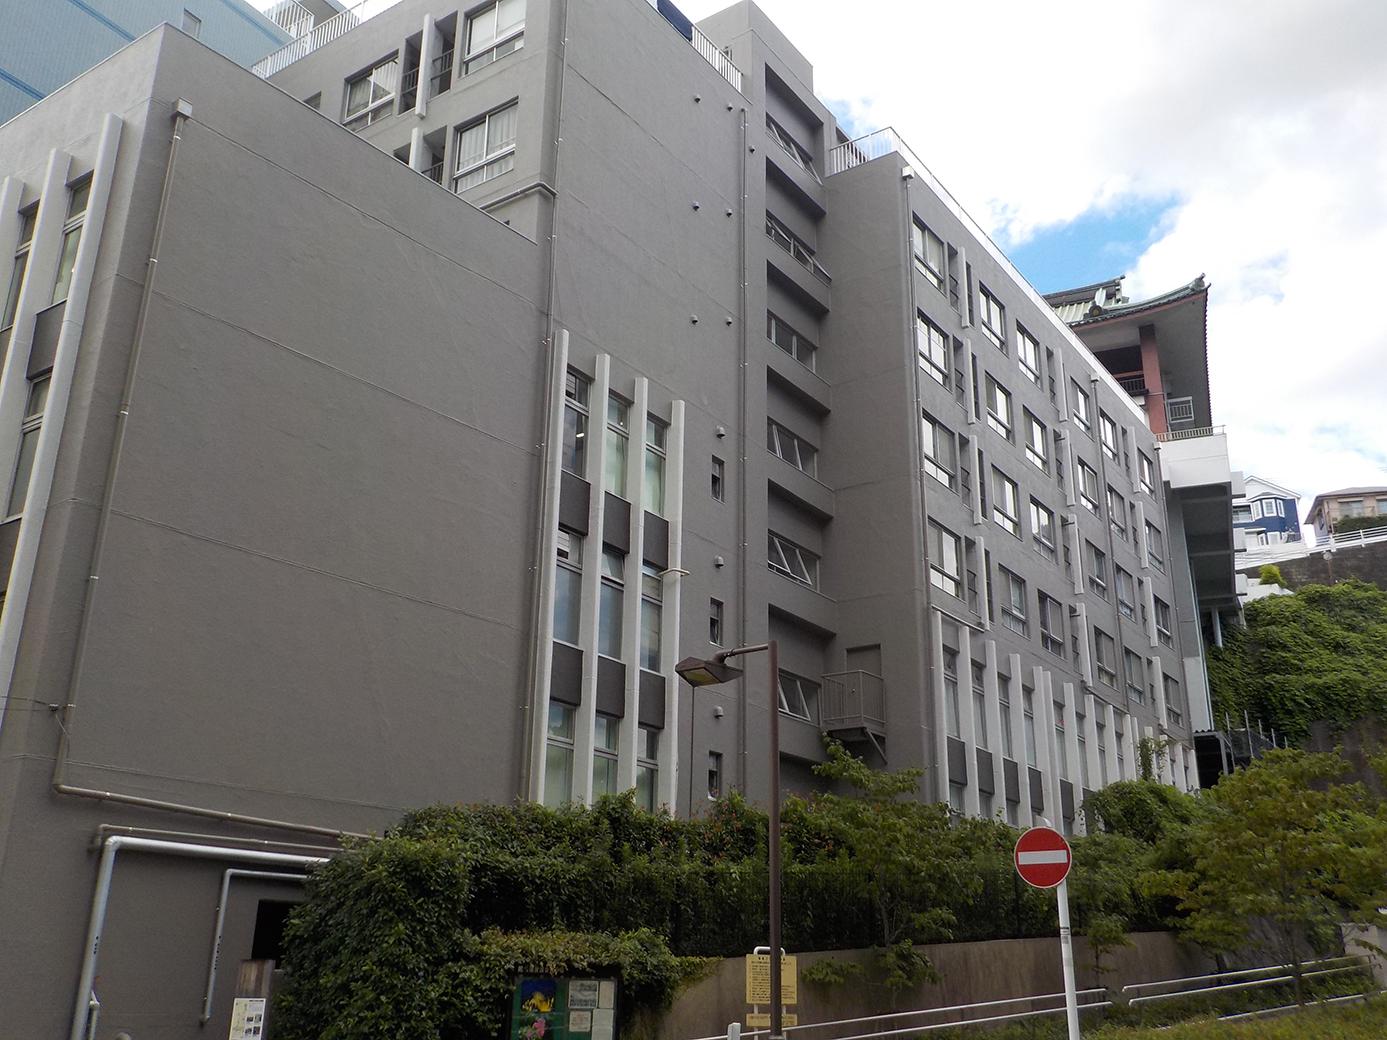 ハイツ横浜大規模修繕工事